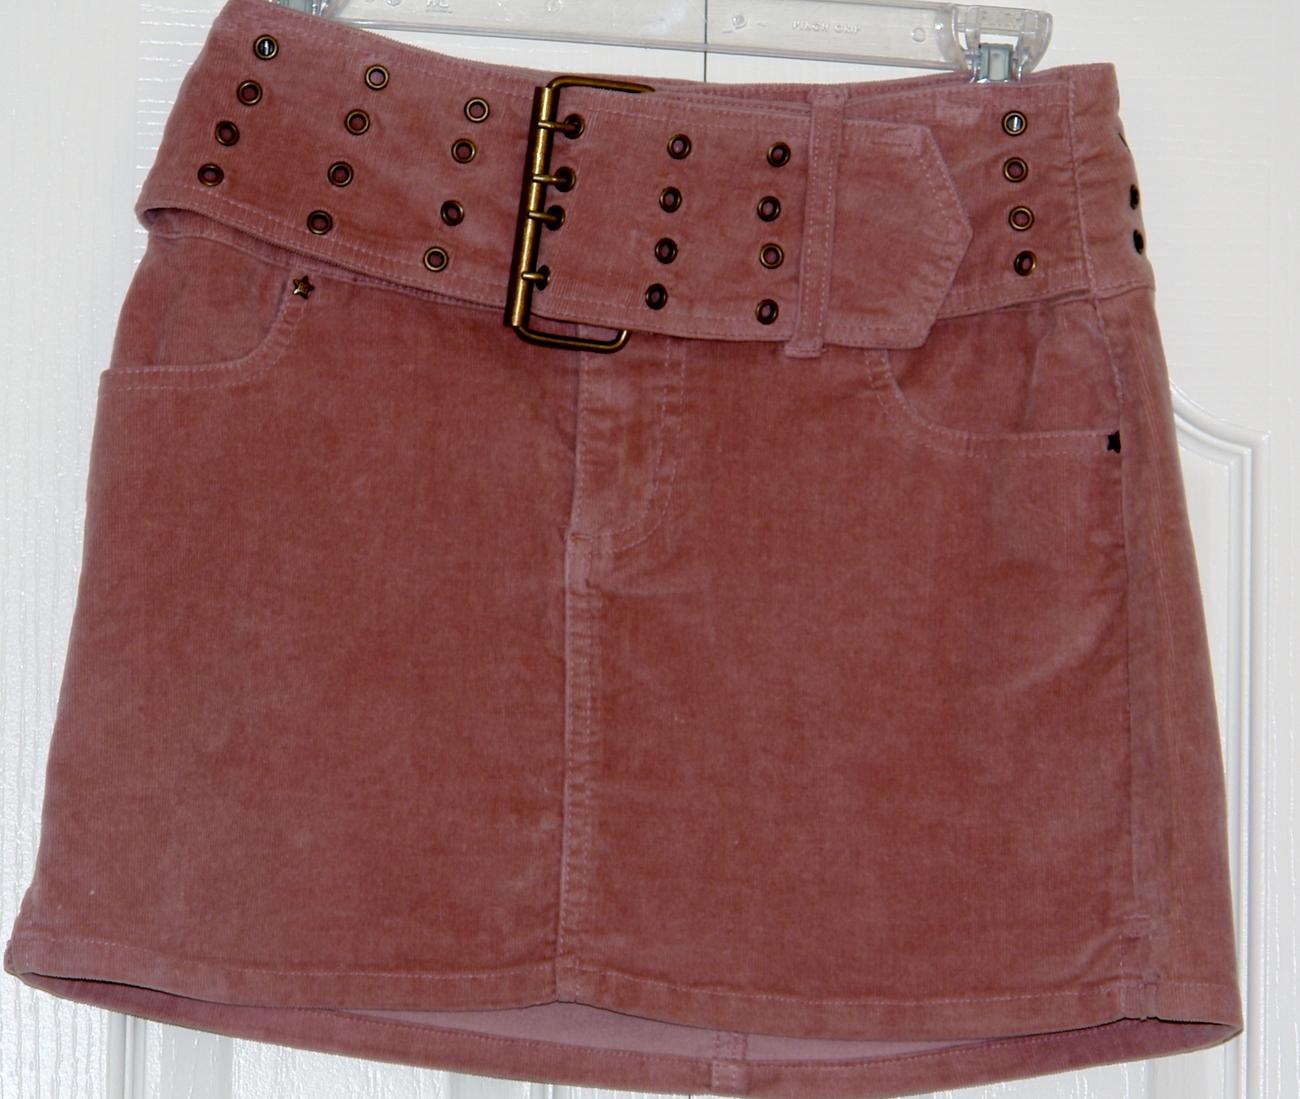 Bubble Gum Mini Skirt Size 5-6 Bonanza